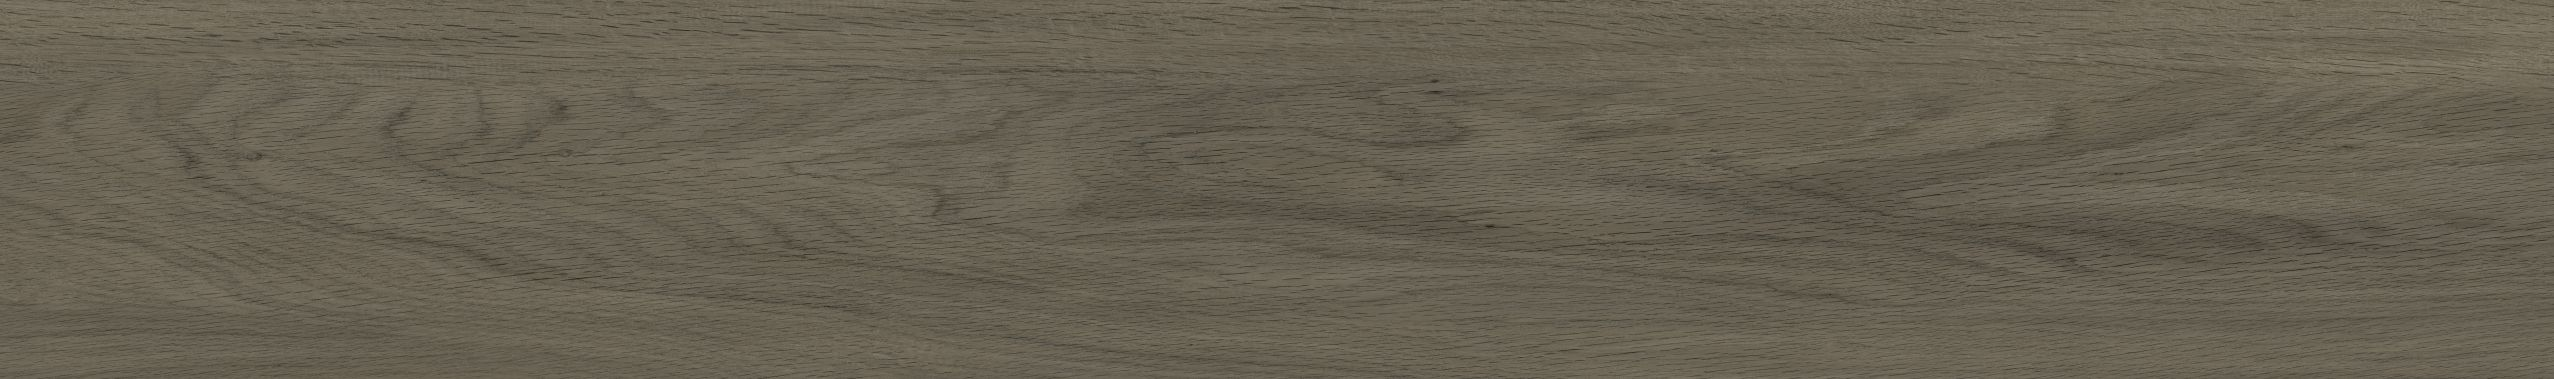 Panele winylowe LVT modulari ® WOOD DRYBACK 19,6 x 132 cm 24957